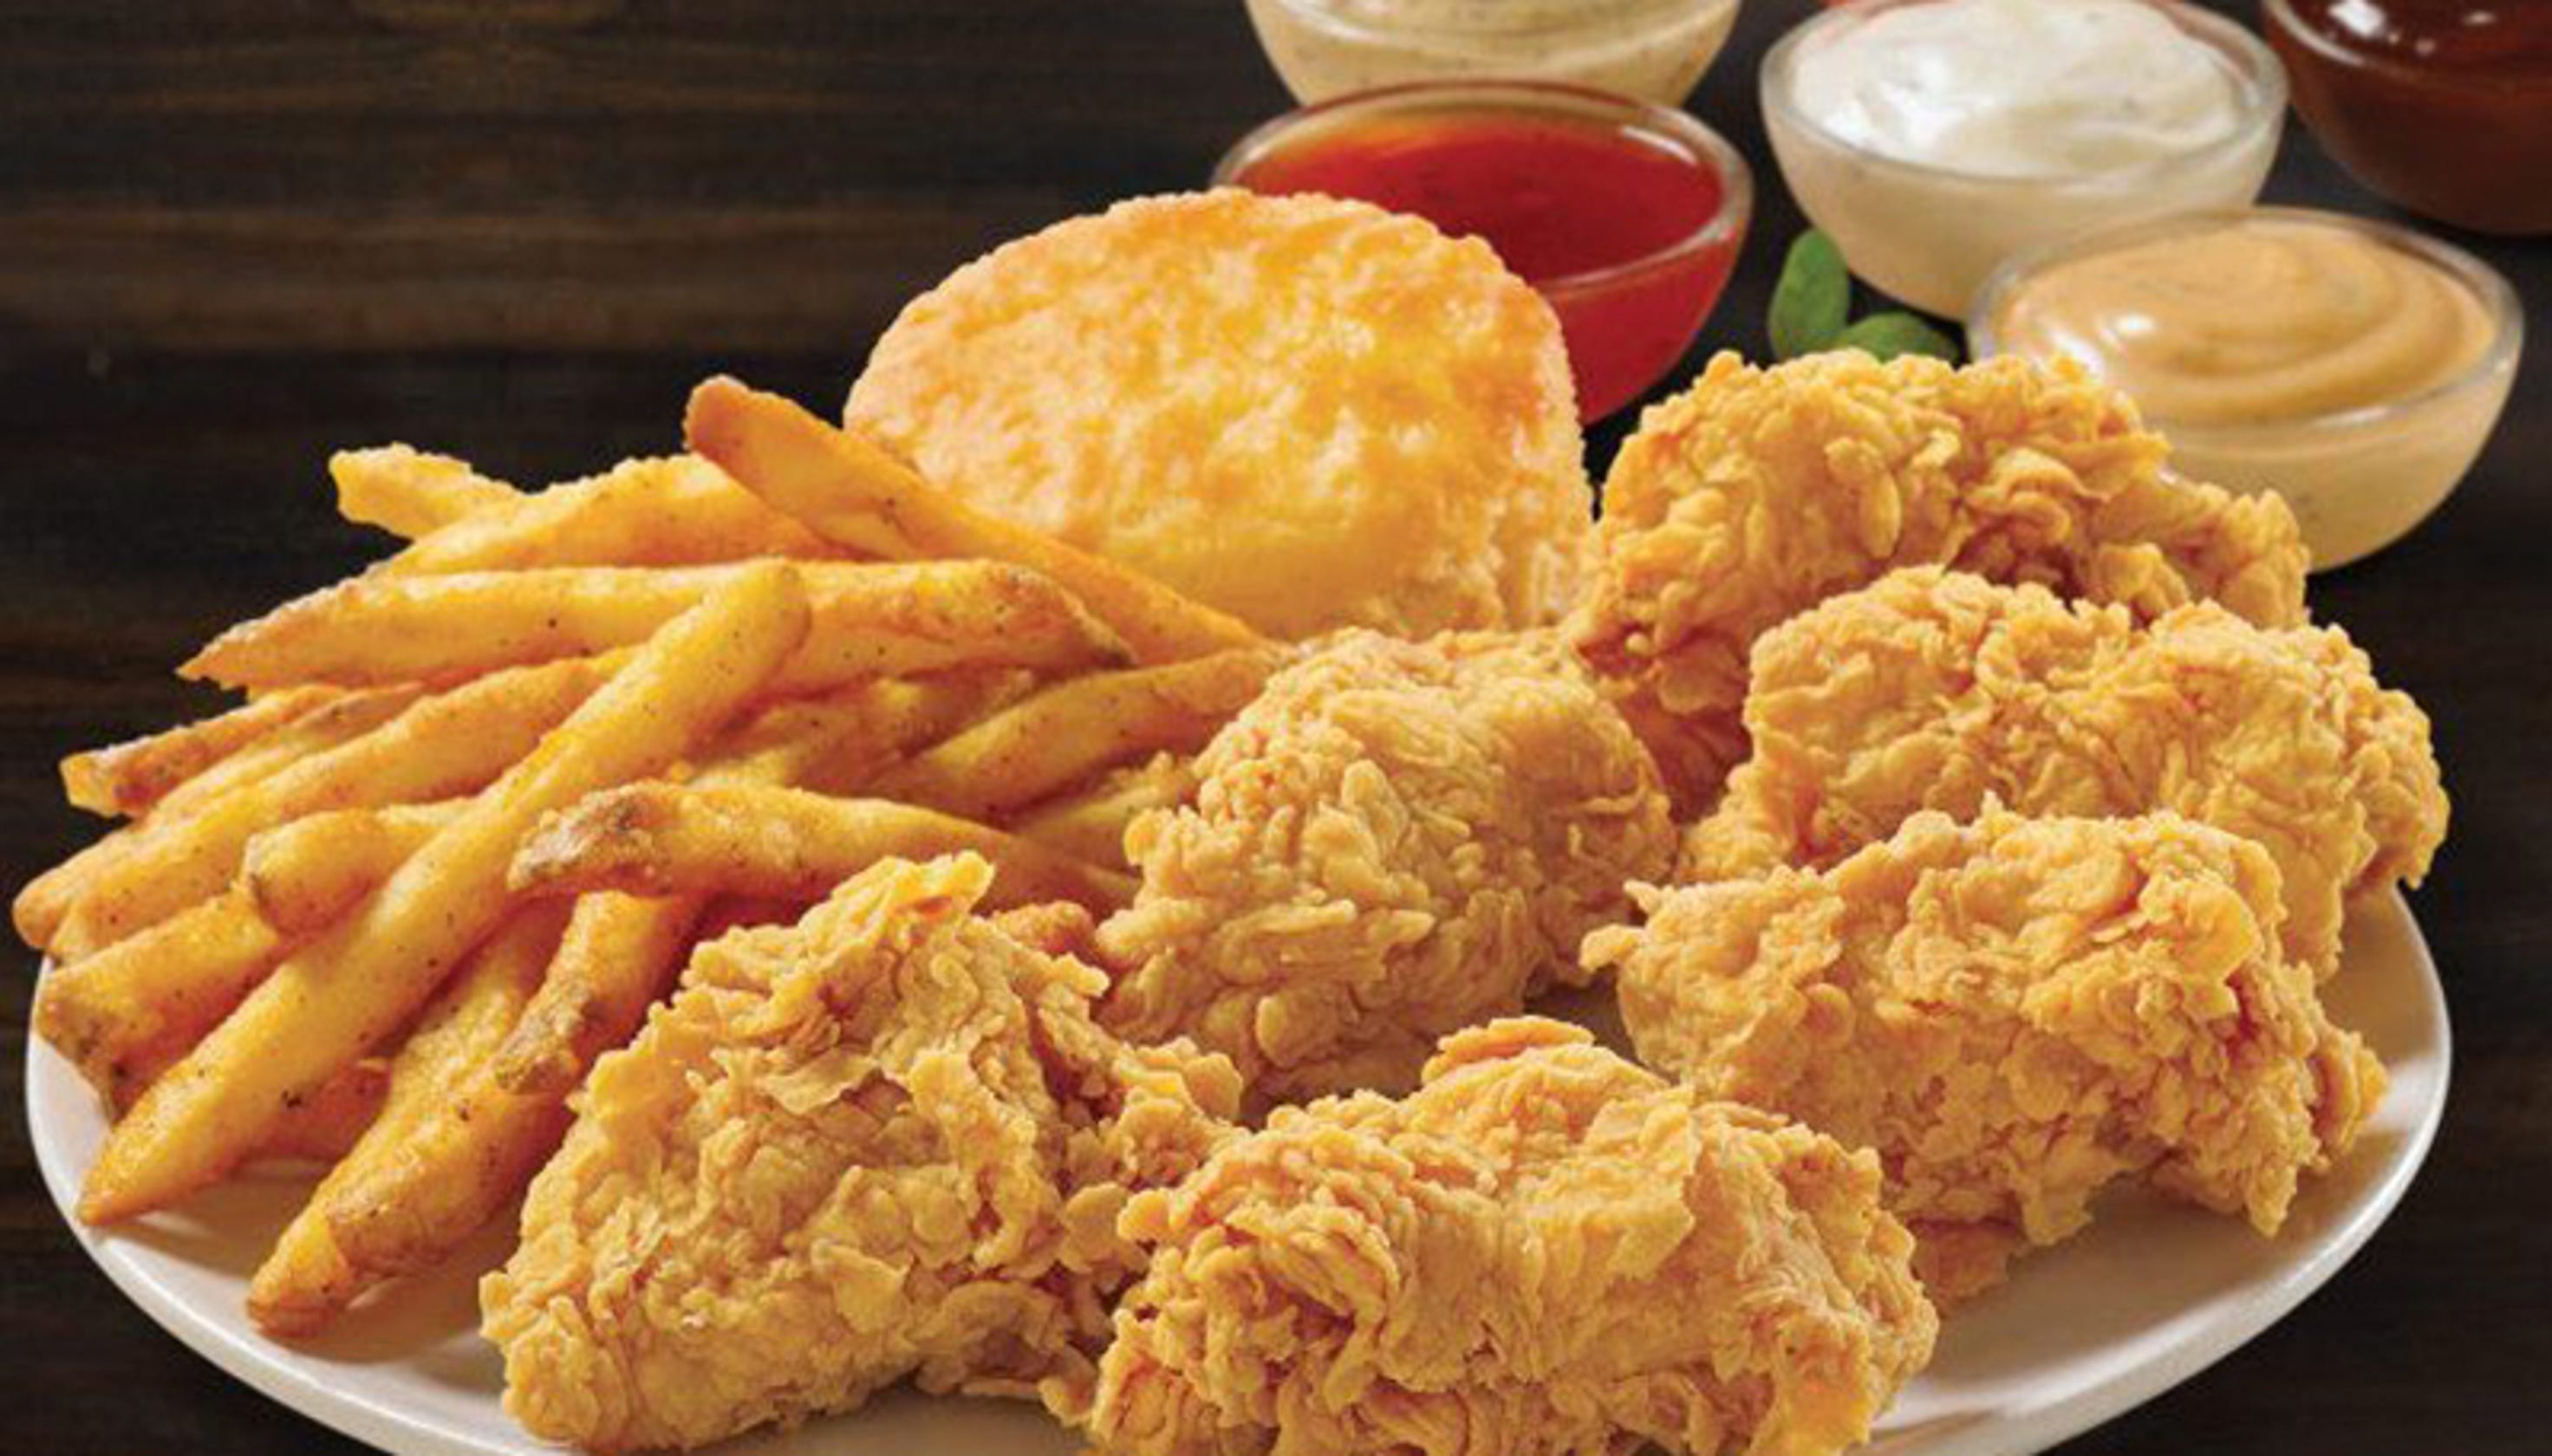 Popeyes Fried Chicken: Popeyes Fried Chicken Restaurant Coming To Bonita Springs